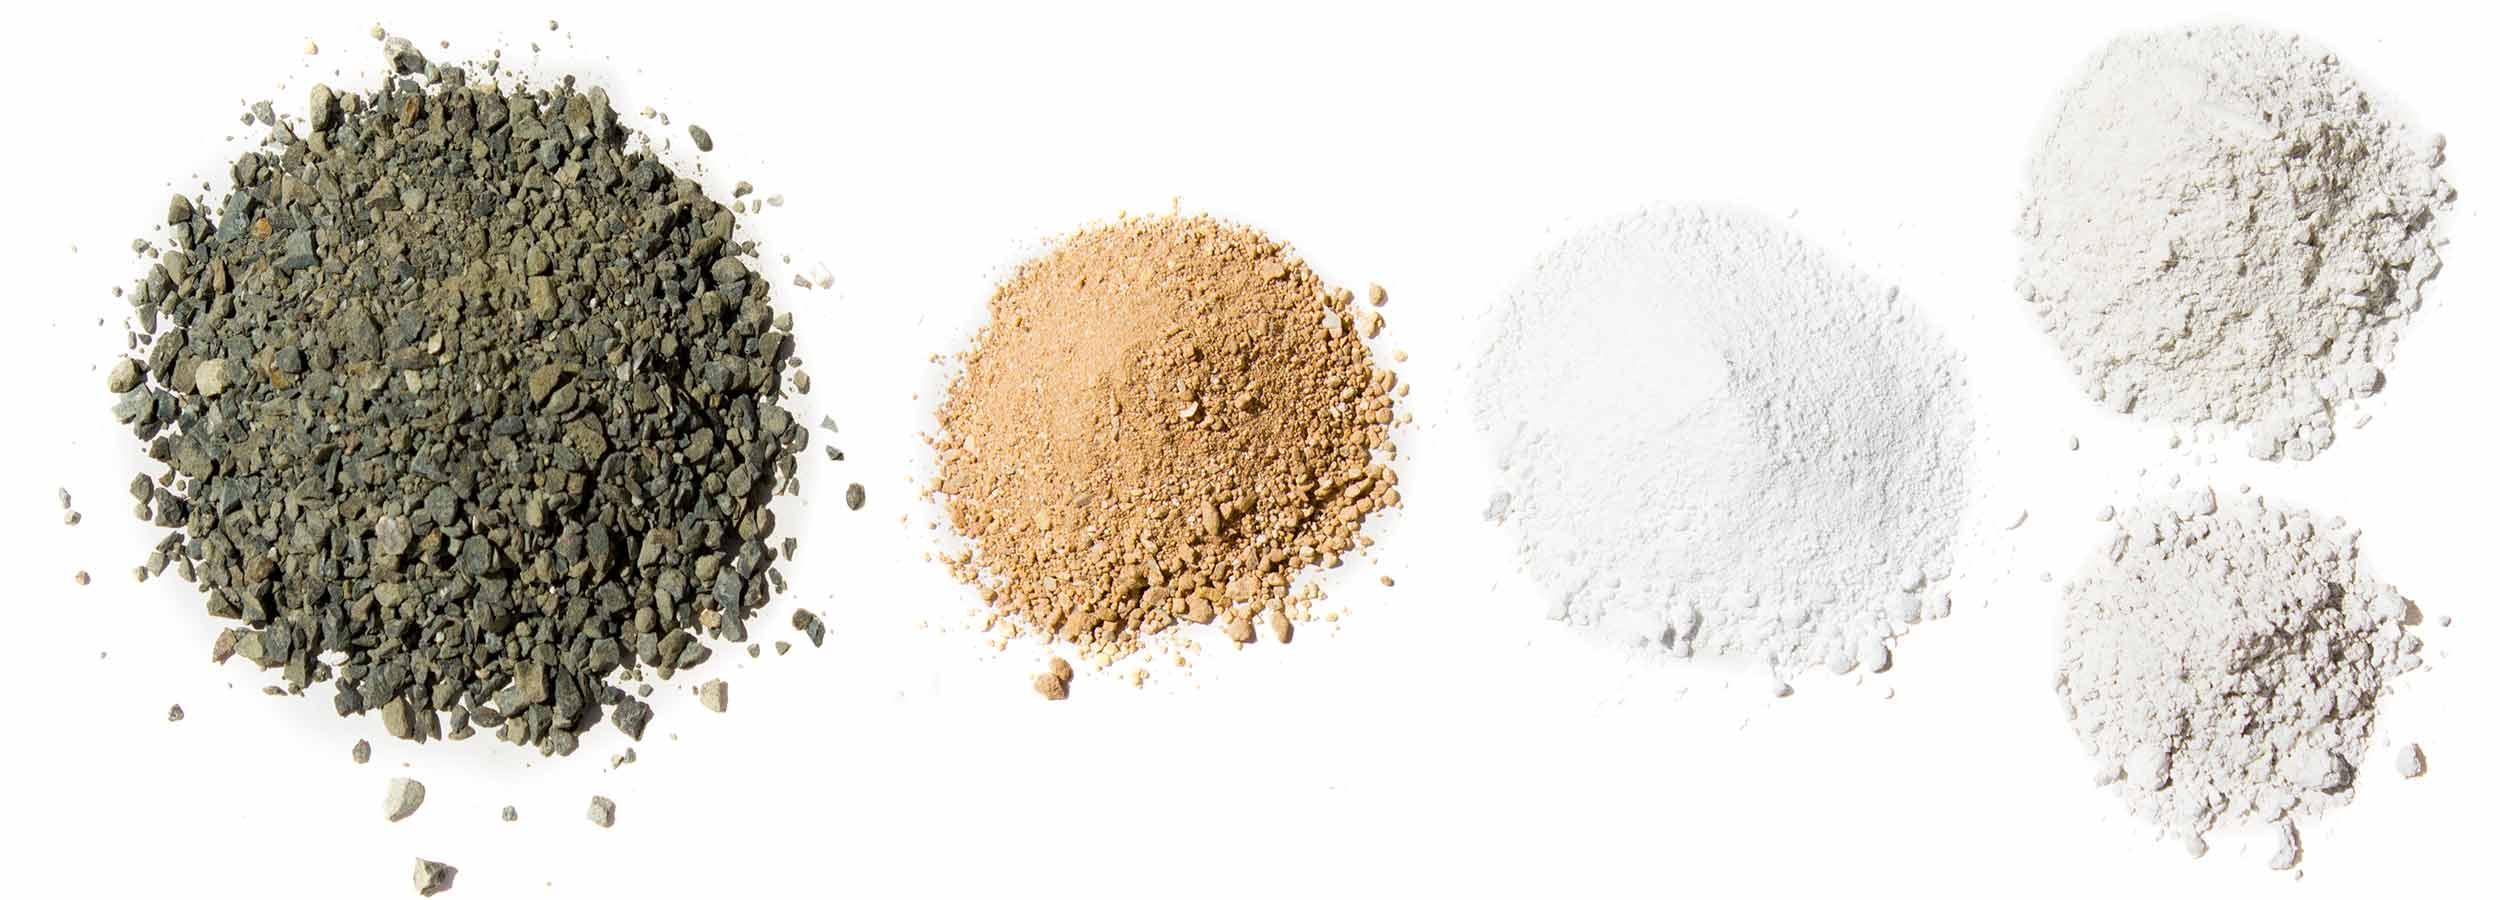 Watershed-Materials-White-Block-Mix-Design.jpg